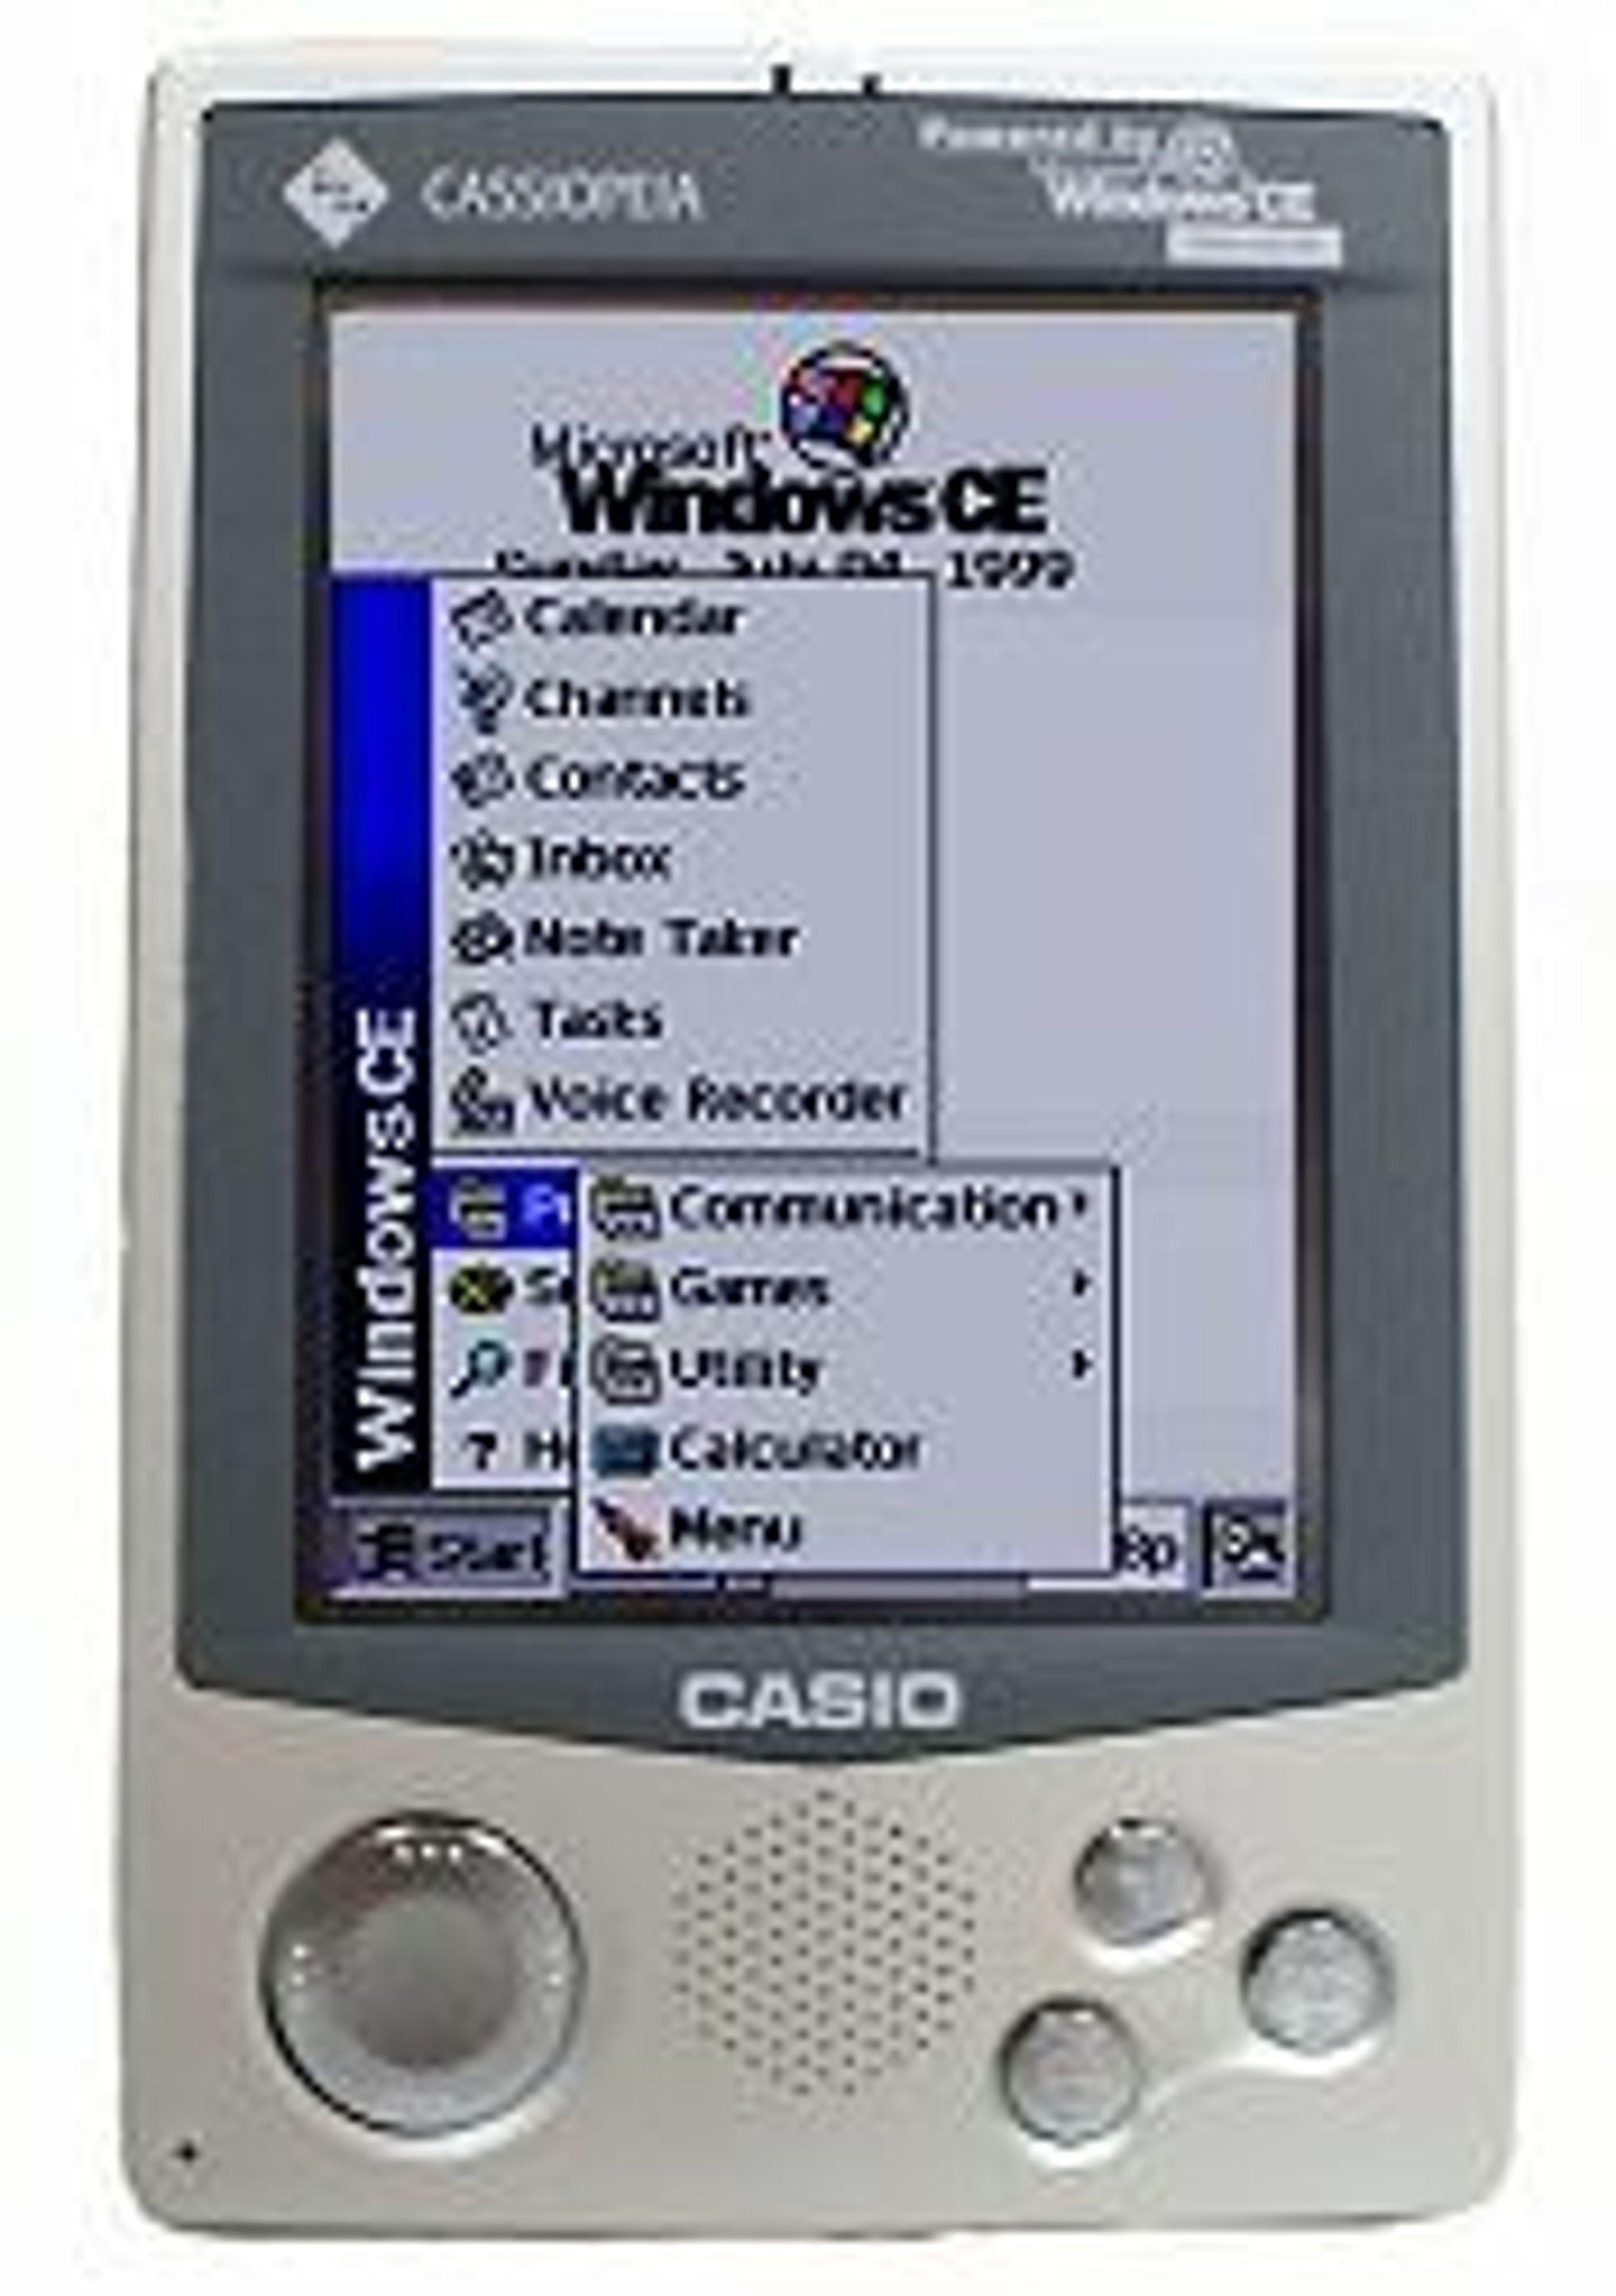 Casio Cassiopeia E-100, PDA med fargeskjerm fra Casio